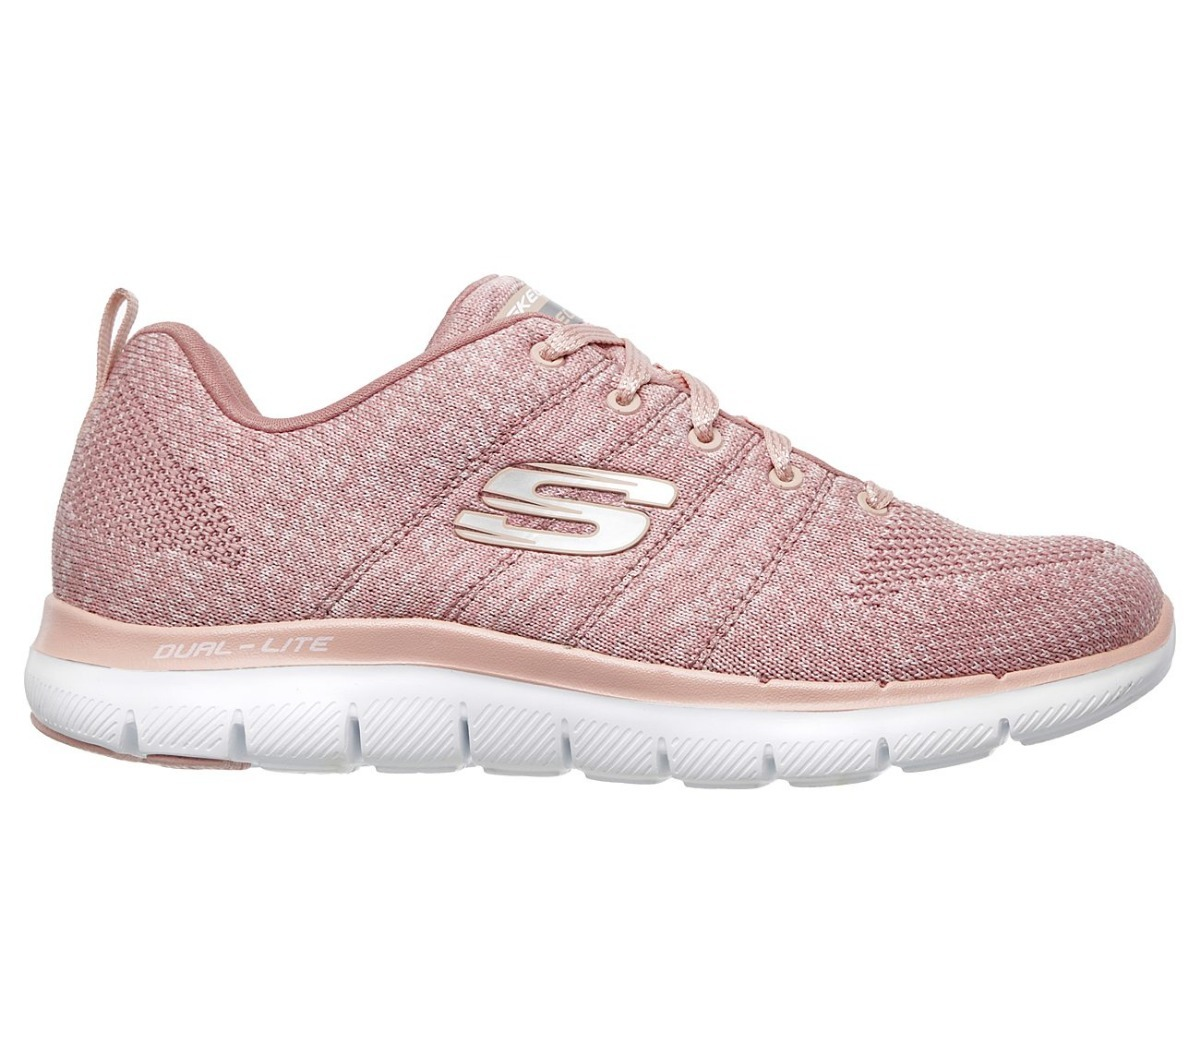 8a88c9d22feab zapatillas deportivas skechers - mujer flex appeal energy. Cargando zoom.